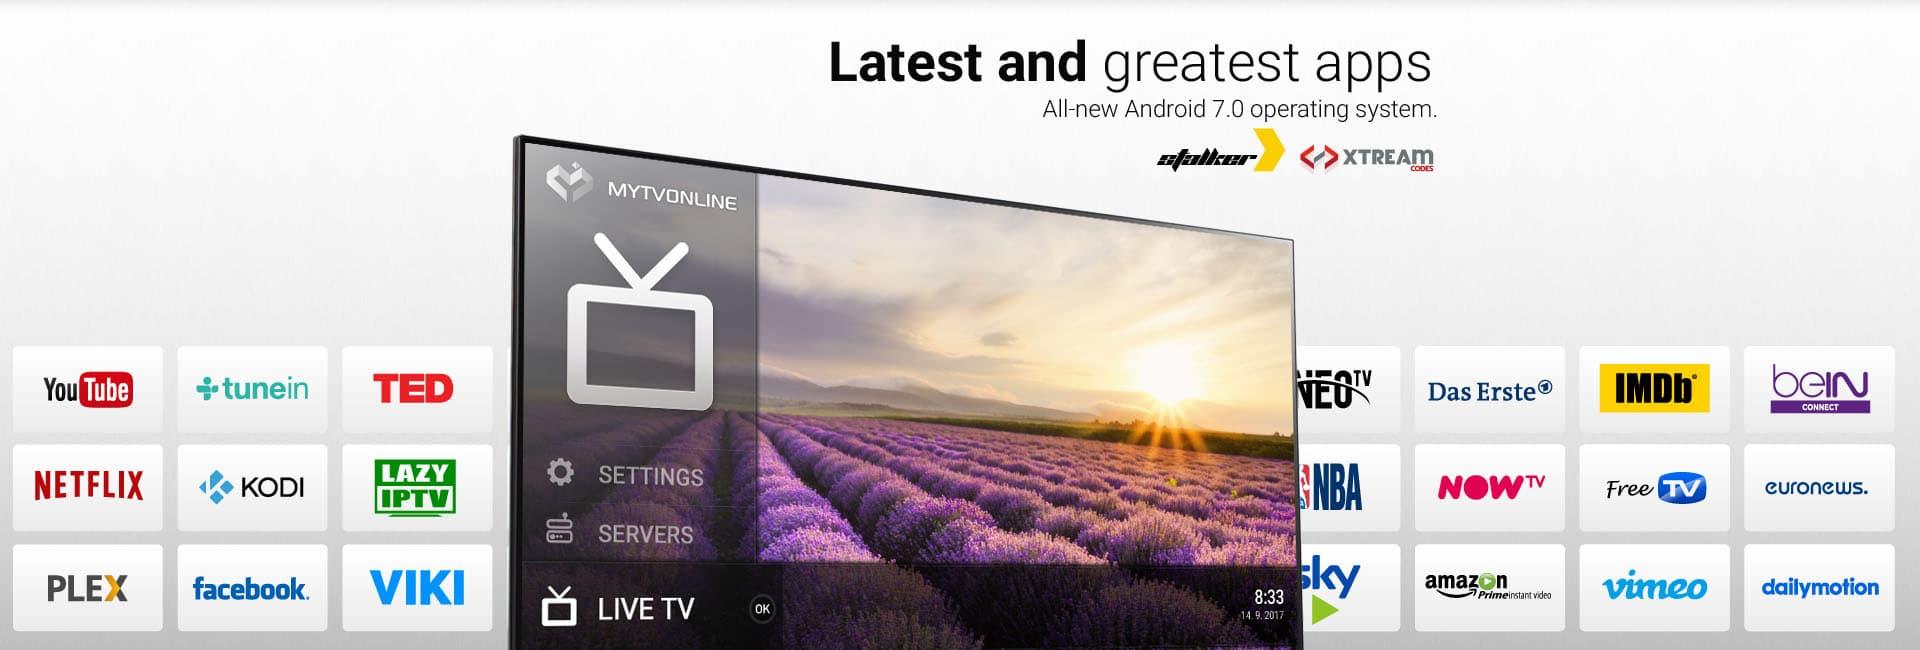 Dreamlink T2 Prime 5G